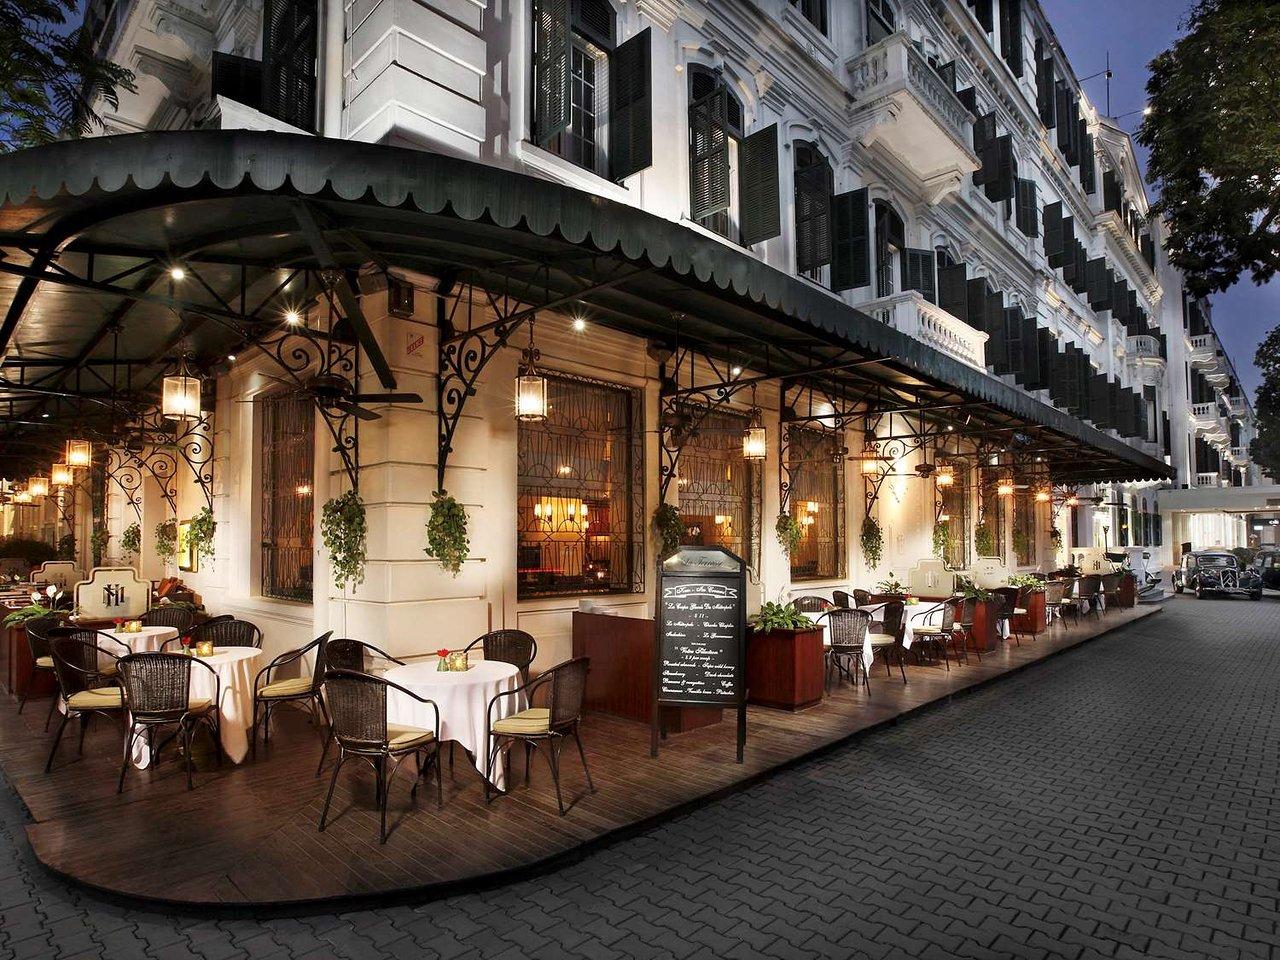 sofitel legend metropole hanoi updated 2019 prices hotel reviews rh tripadvisor com